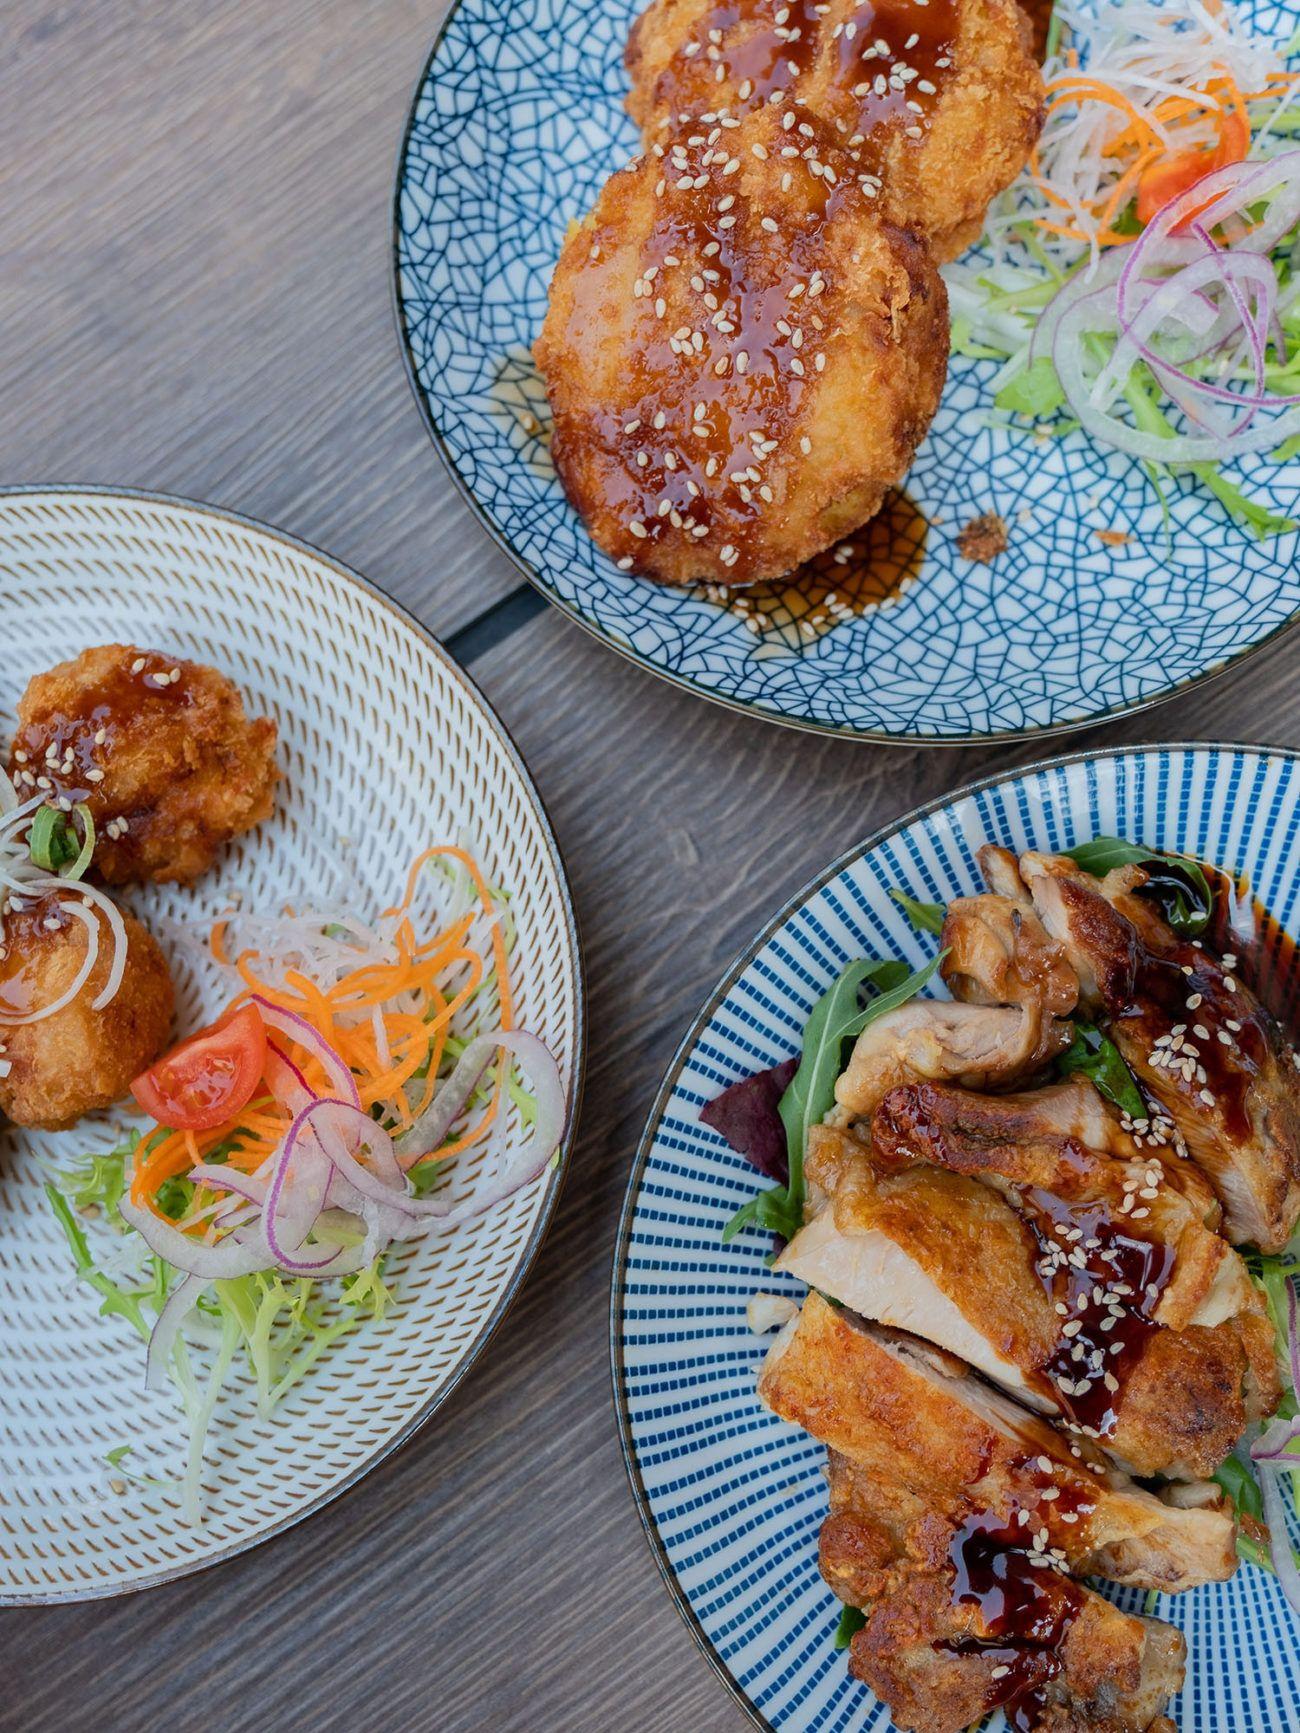 Foodblog About Fuel, Restaurant CHOTTO Berlin, Chicken Teriyaki, Kroketten